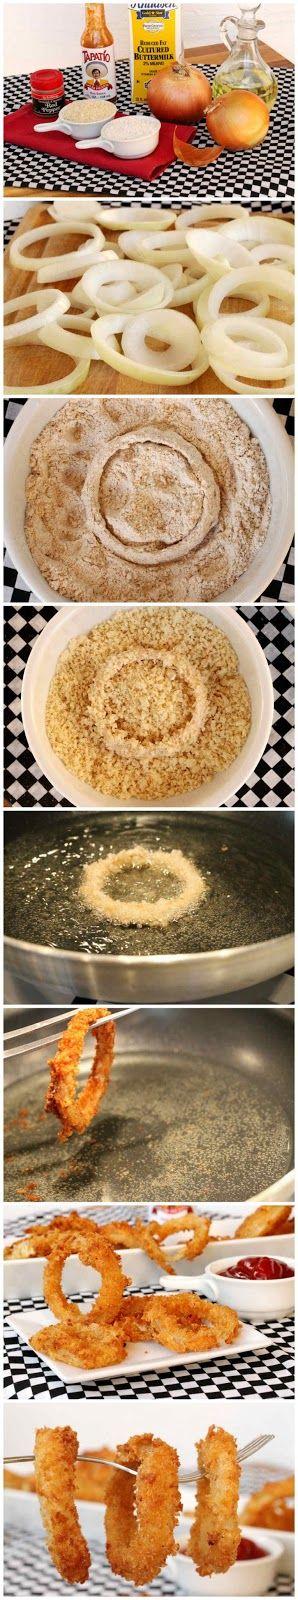 Crispy Onion Rings Recipe